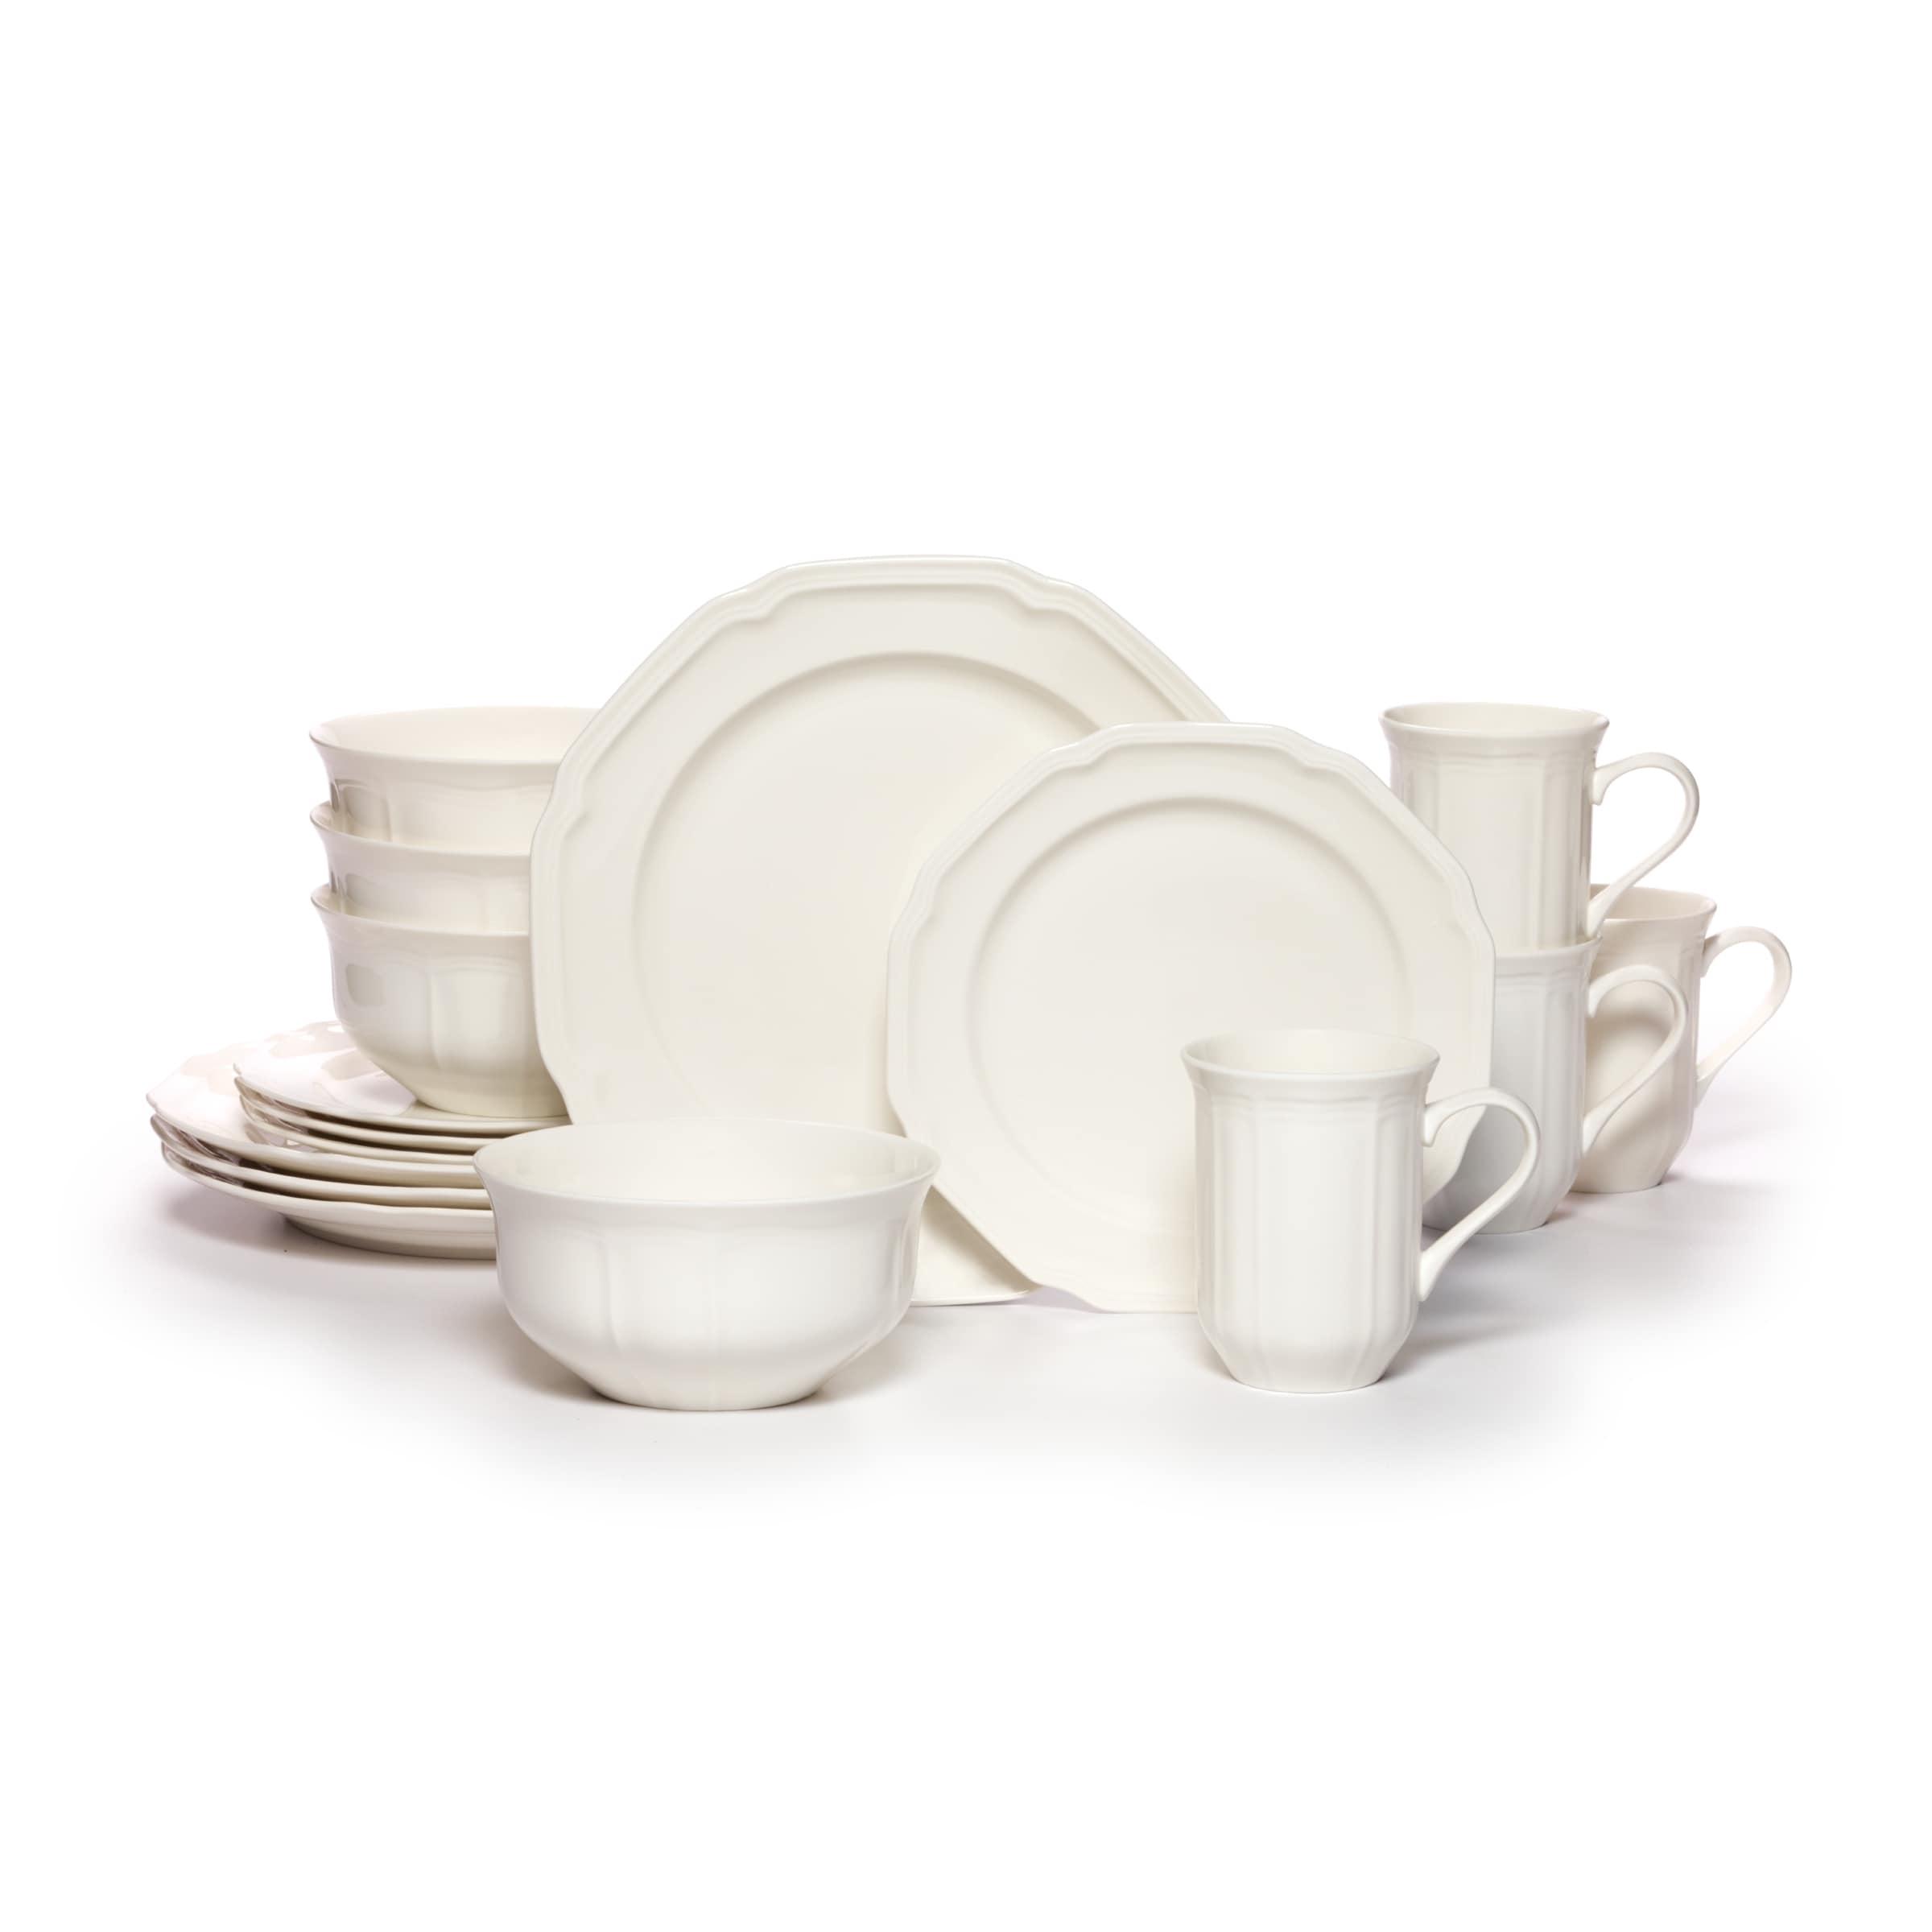 Mikasa Round Antique White Porcelain 16 Piece Dinnerware Set Overstock 12094870